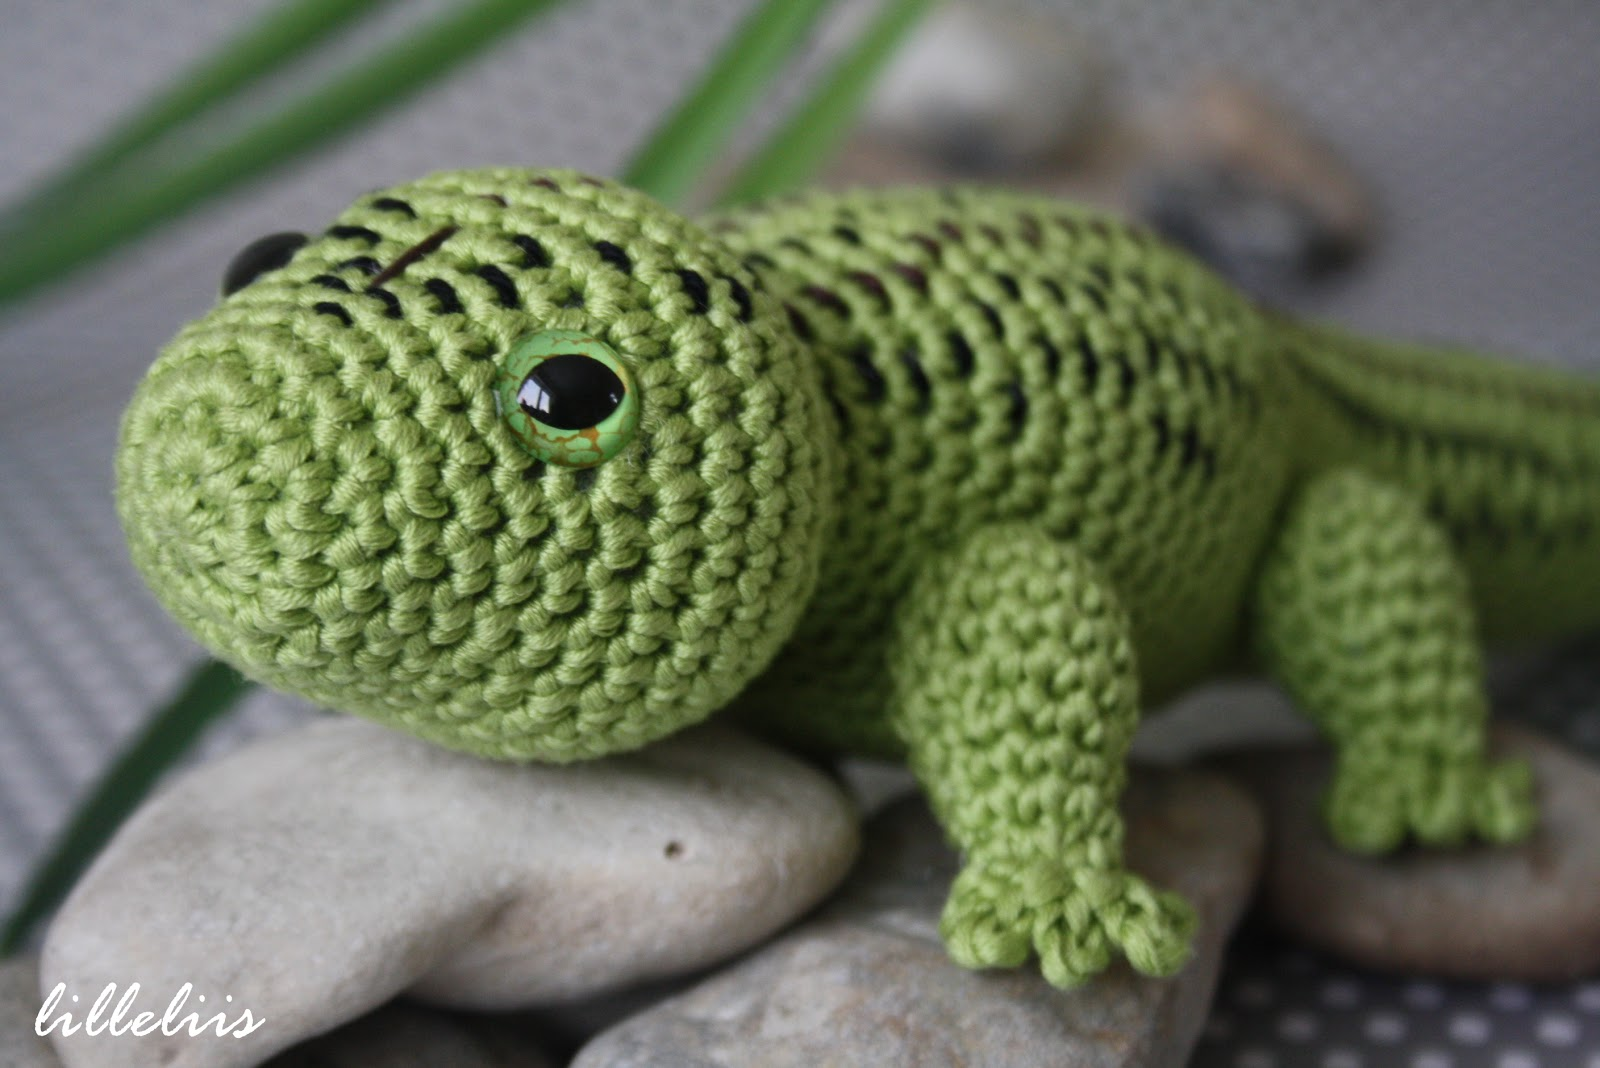 Amazing Crochet Lizard Pattern Free Adornment - Sewing Pattern for ...